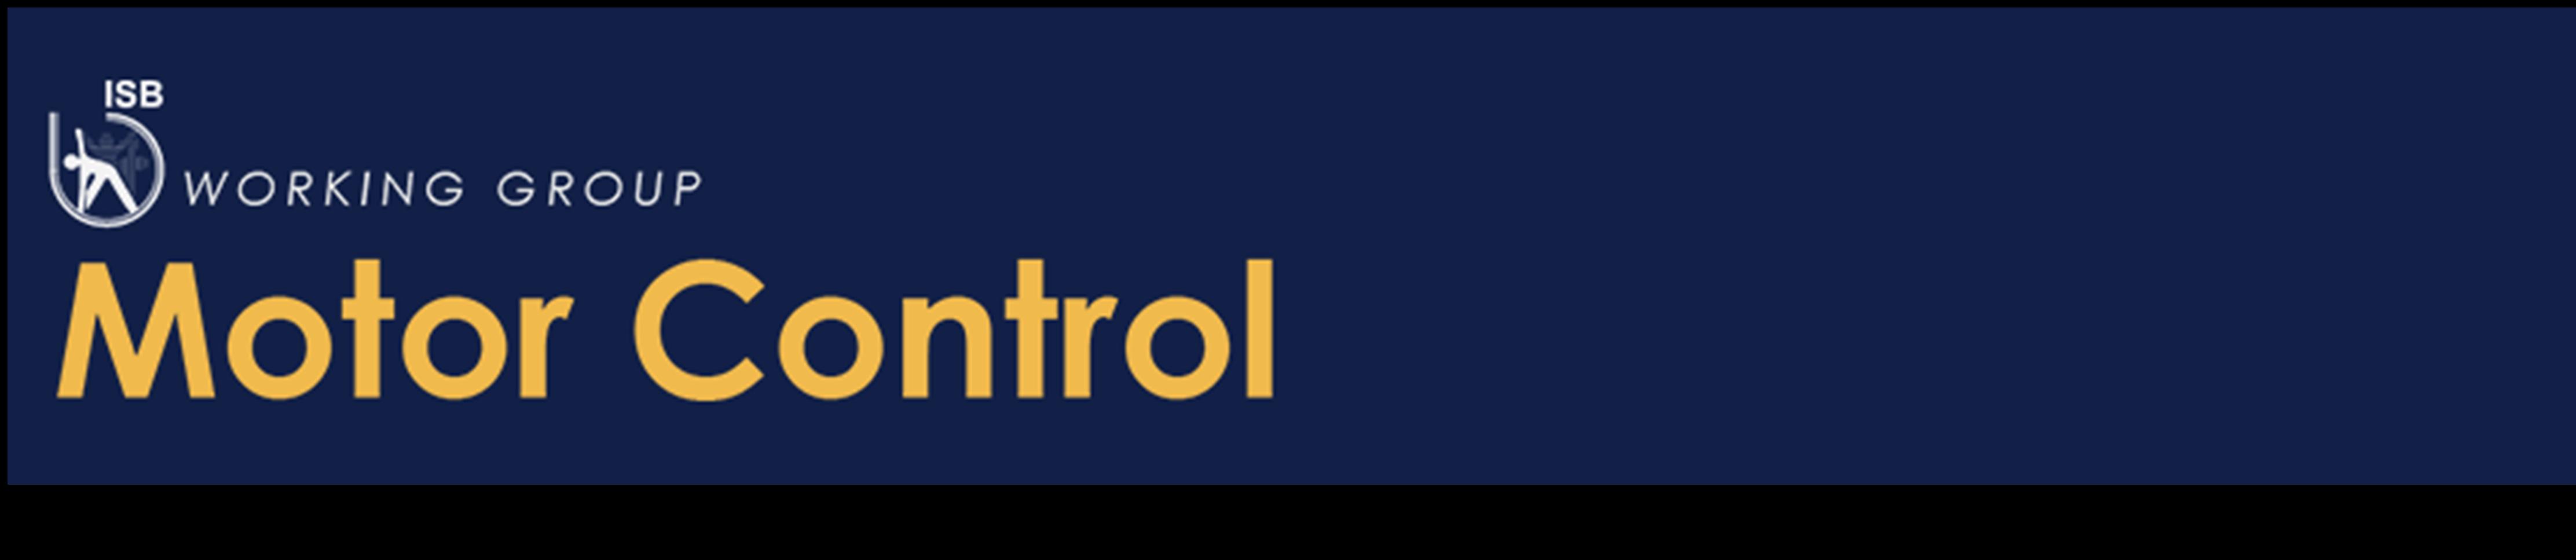 motor control logo